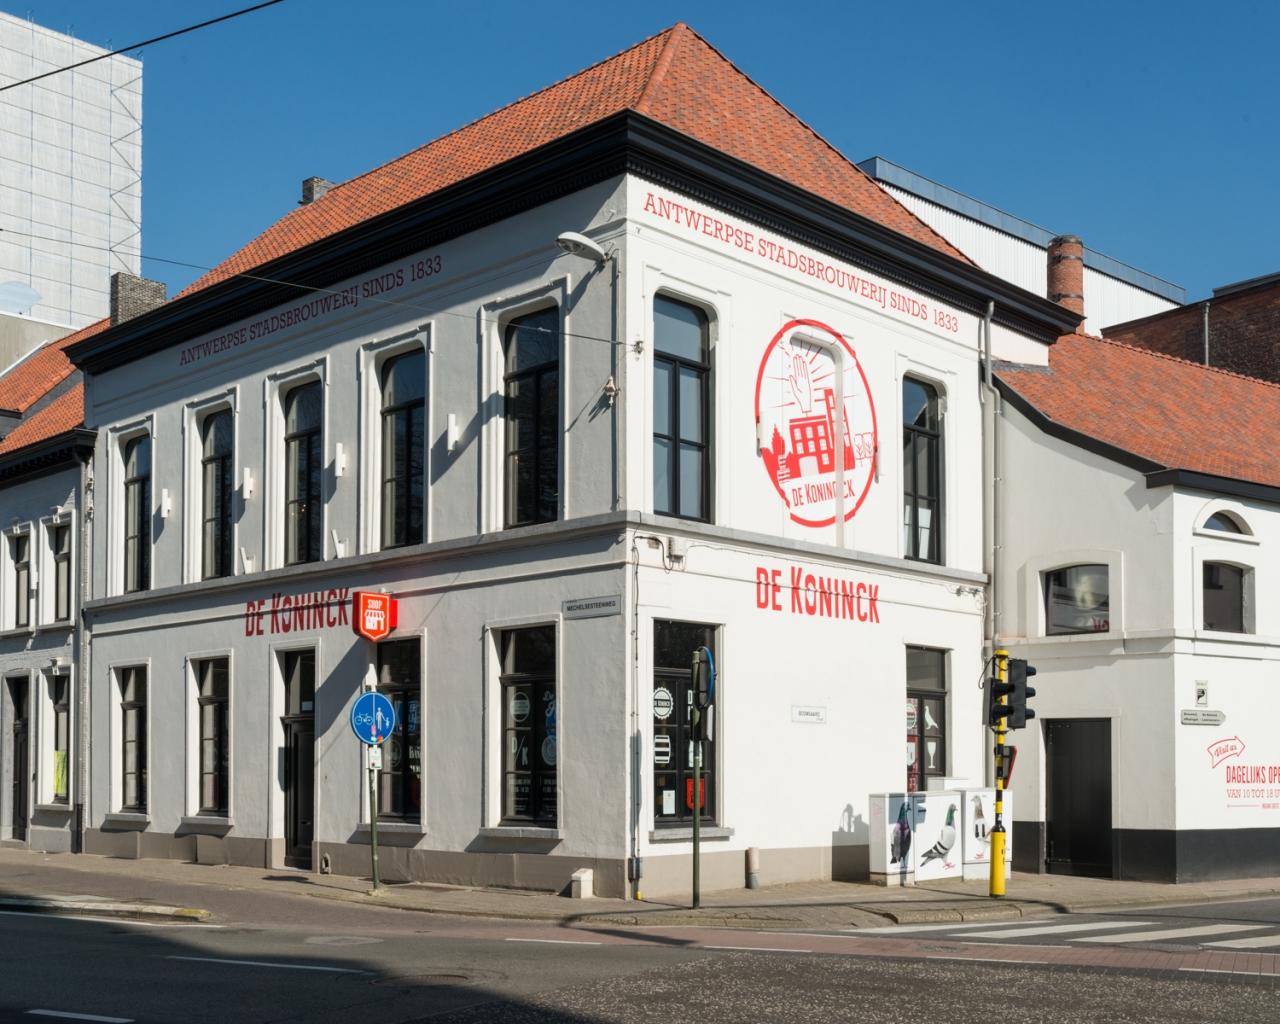 FRANÇOIS CAVELIER De Koninck Brewery. Antwerp. MONOCLE